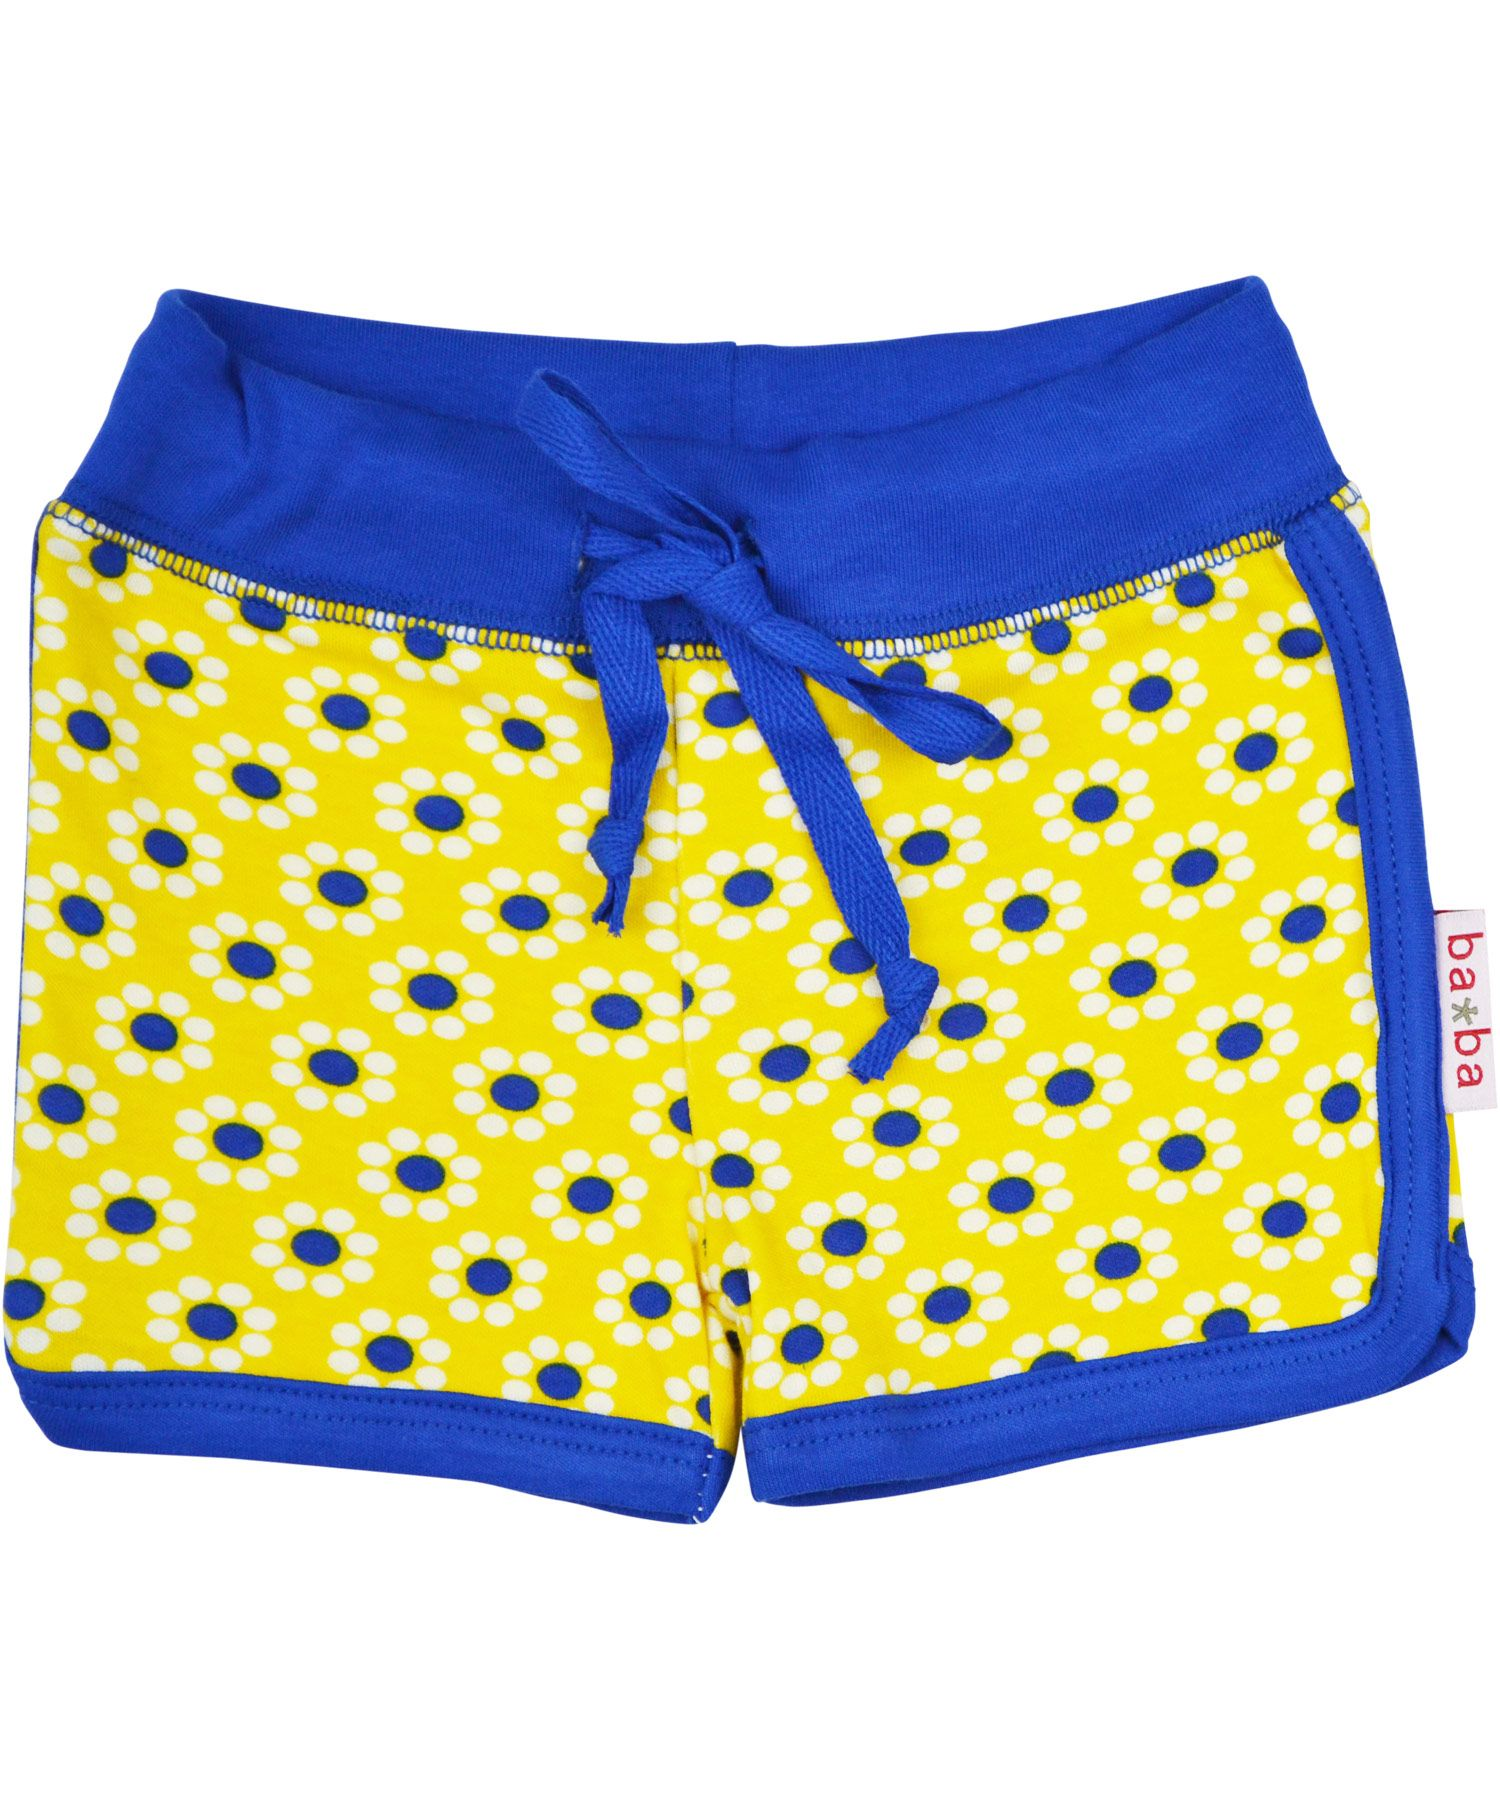 Baba Babywear yellow flower printed short shorts. baba-babywear.en.emilea.be